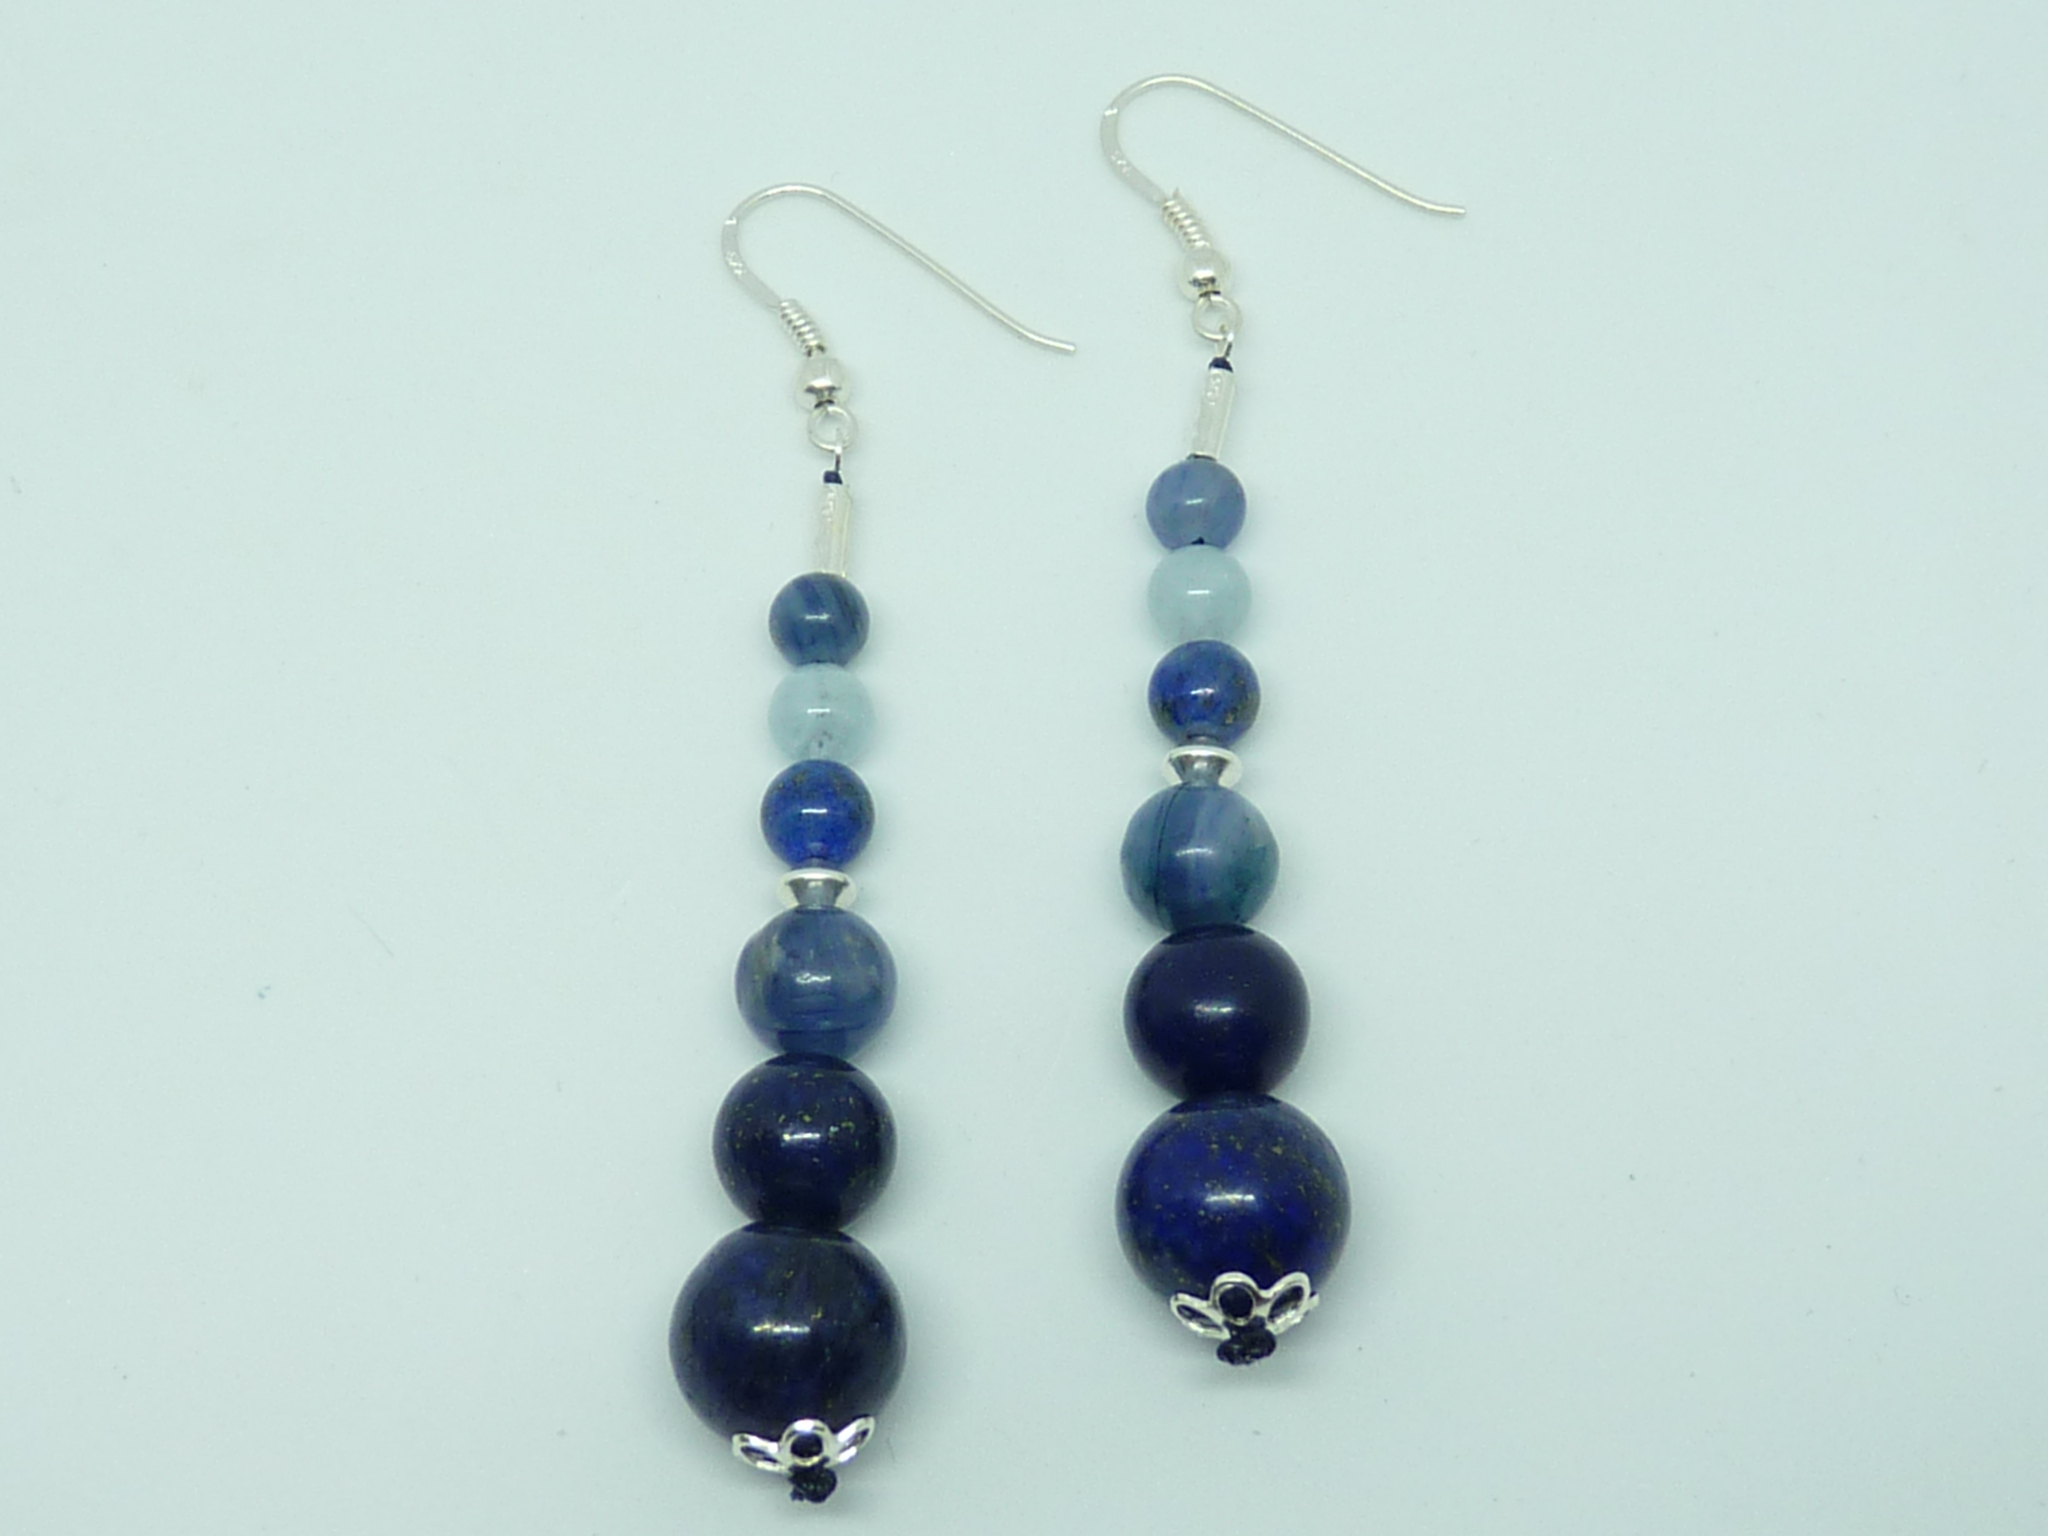 Lapis lazuli - Cyanite - Aigue marine (39€)